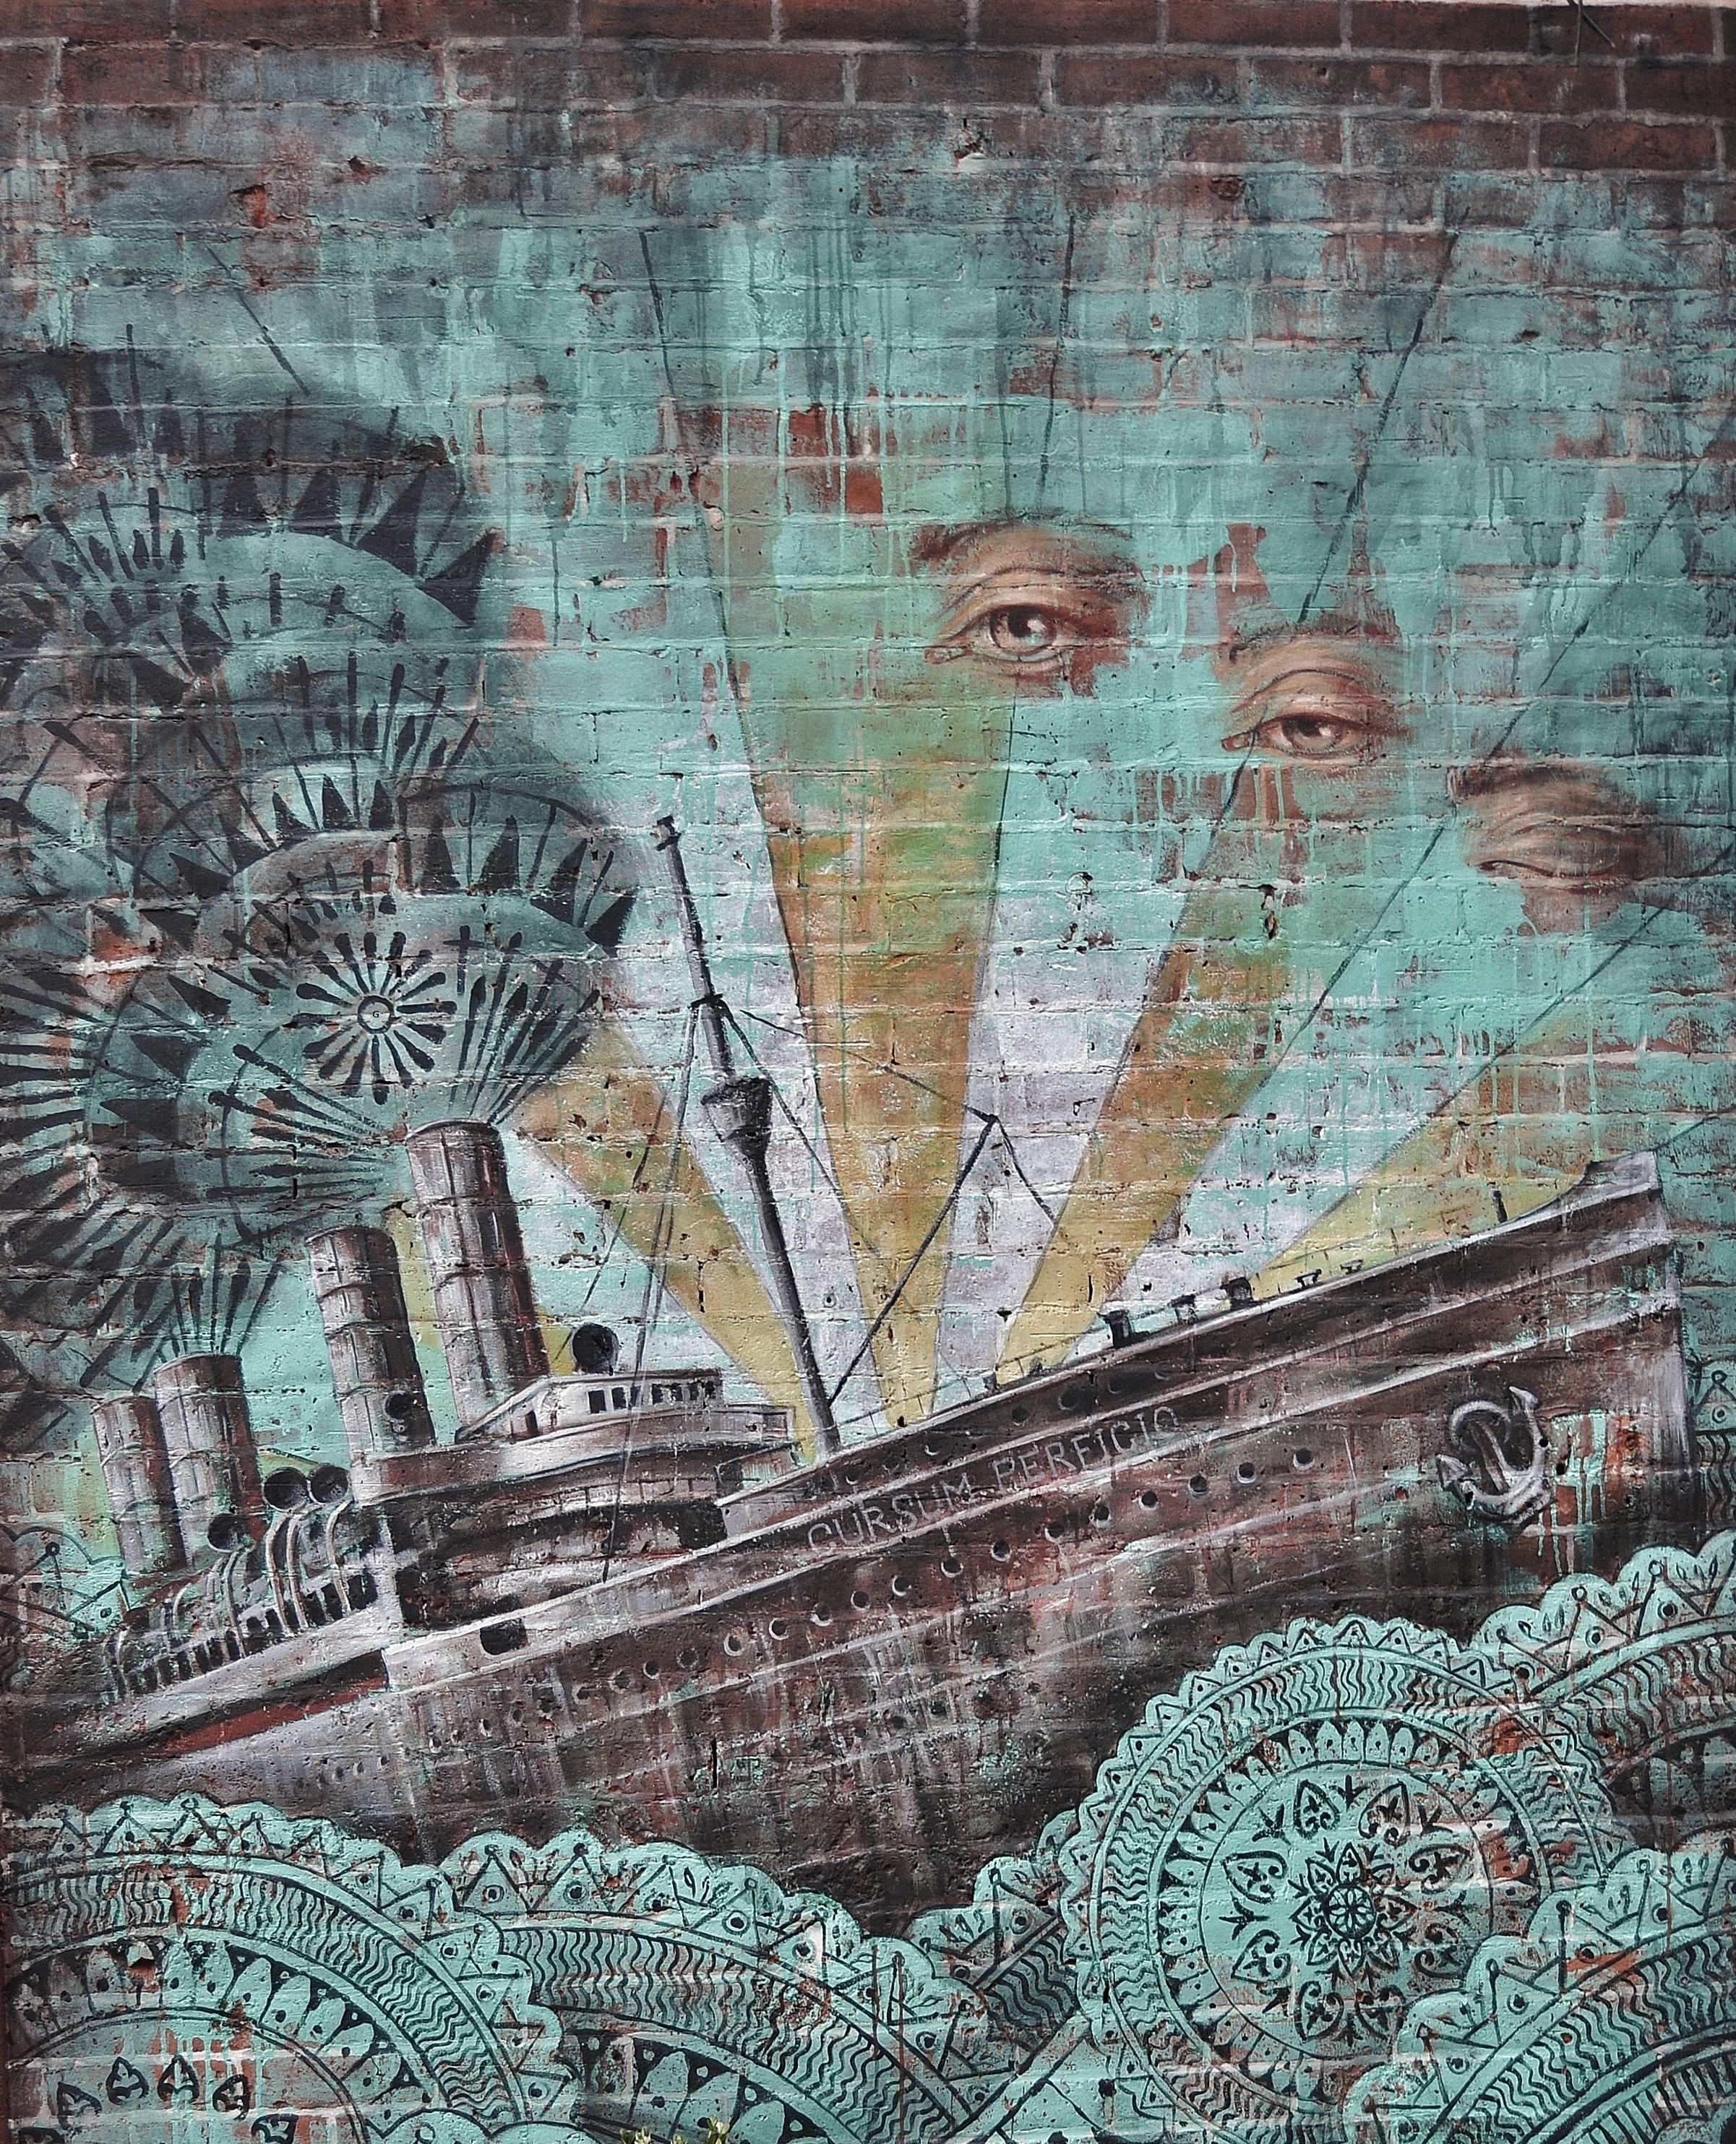 Ship and human eye painted on wall photo